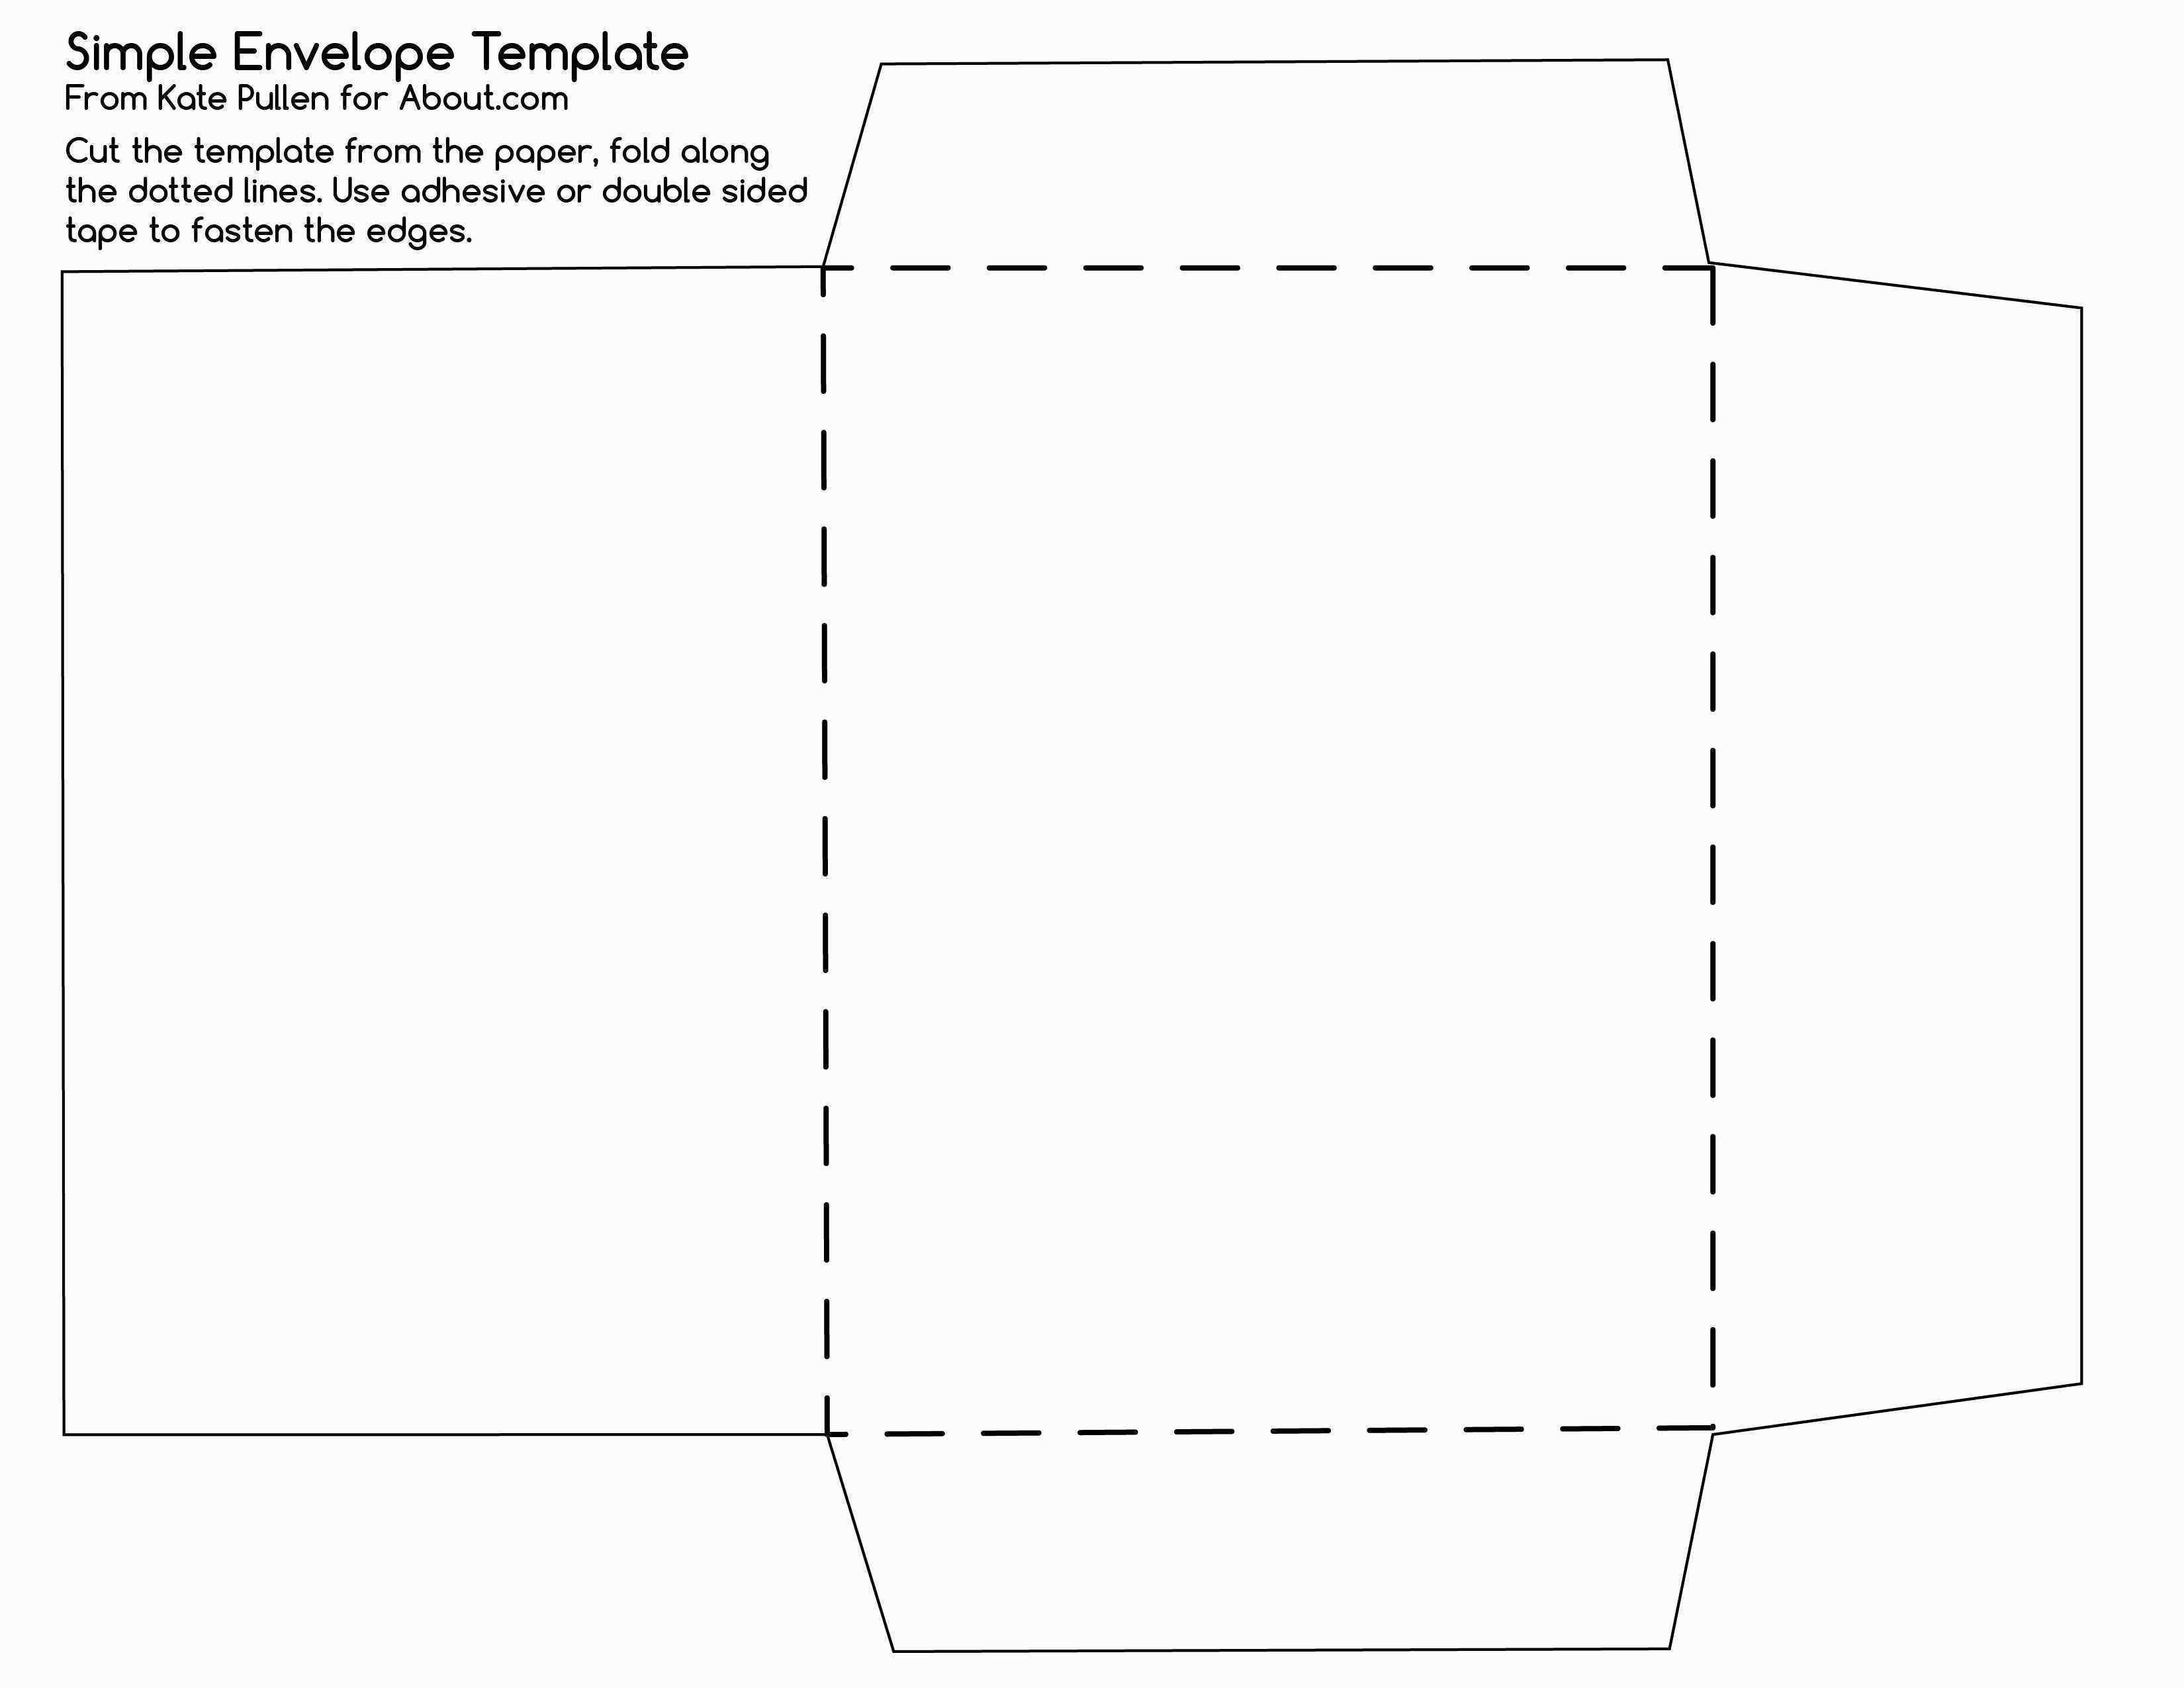 Free Printable Tea Bag Envelopes Inspirational How To Make Envelopes - Free Printable Greeting Card Envelope Template